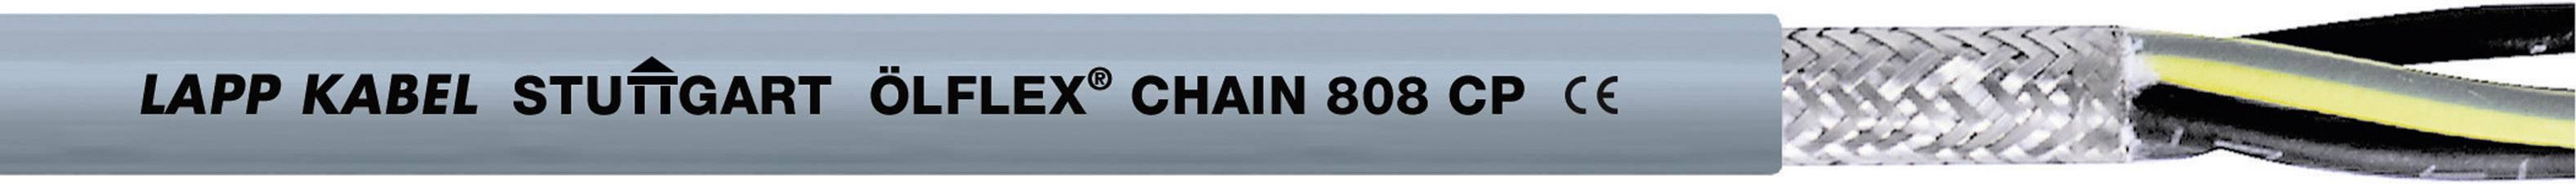 Žíla kabelu LappKabel ÖLFLEX CHAIN 808 CP 2X0,75 (1027759), 2x 0,75 mm², polyurethan, Ø 6,2 mm, stíněný, 1 m,